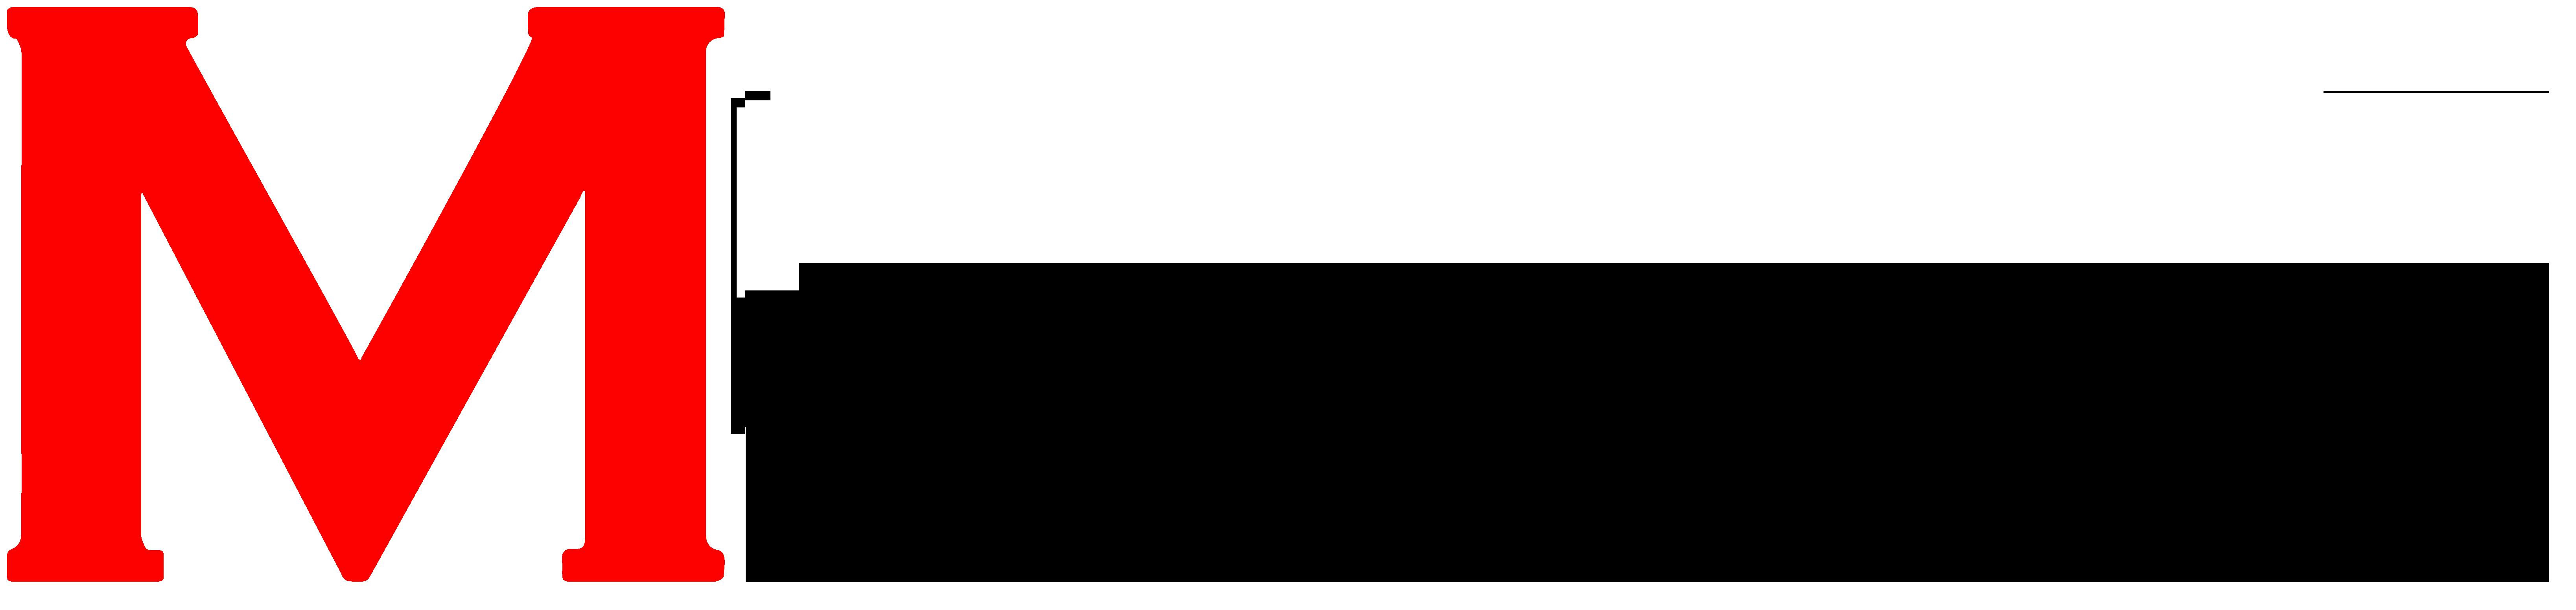 Morphe_Brushes_logo